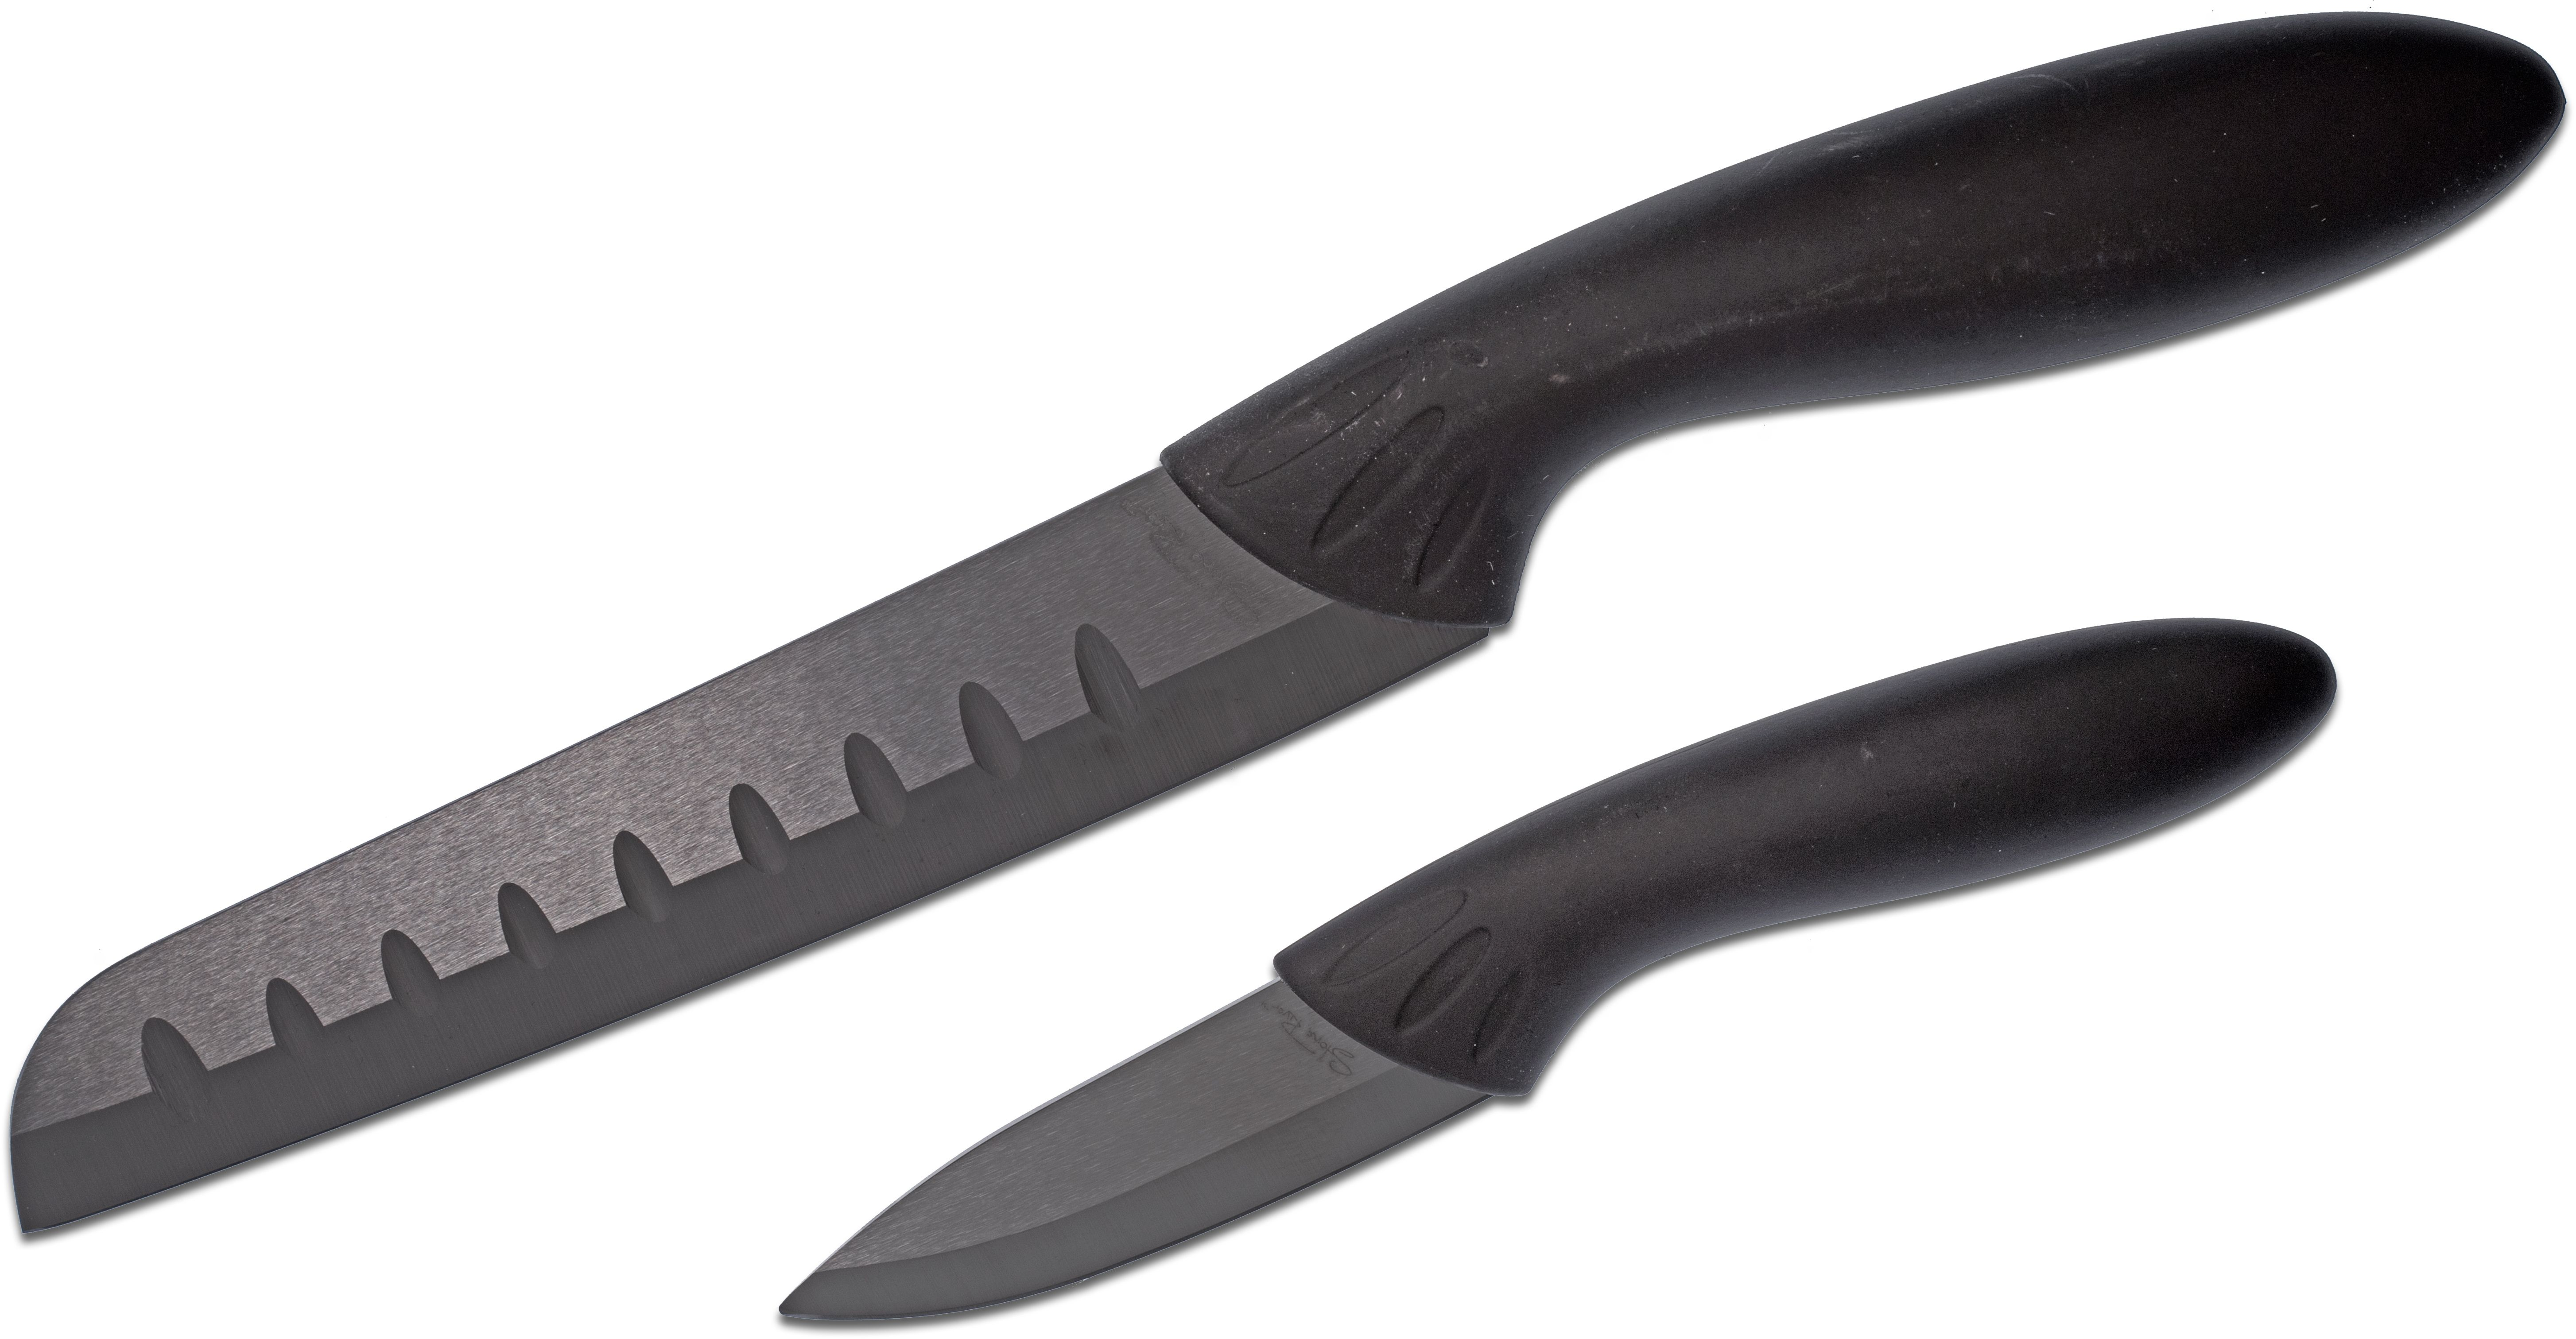 Stone River Gear Two Piece Black Ceramic Santoku/Paring Knife Set, Black Handles